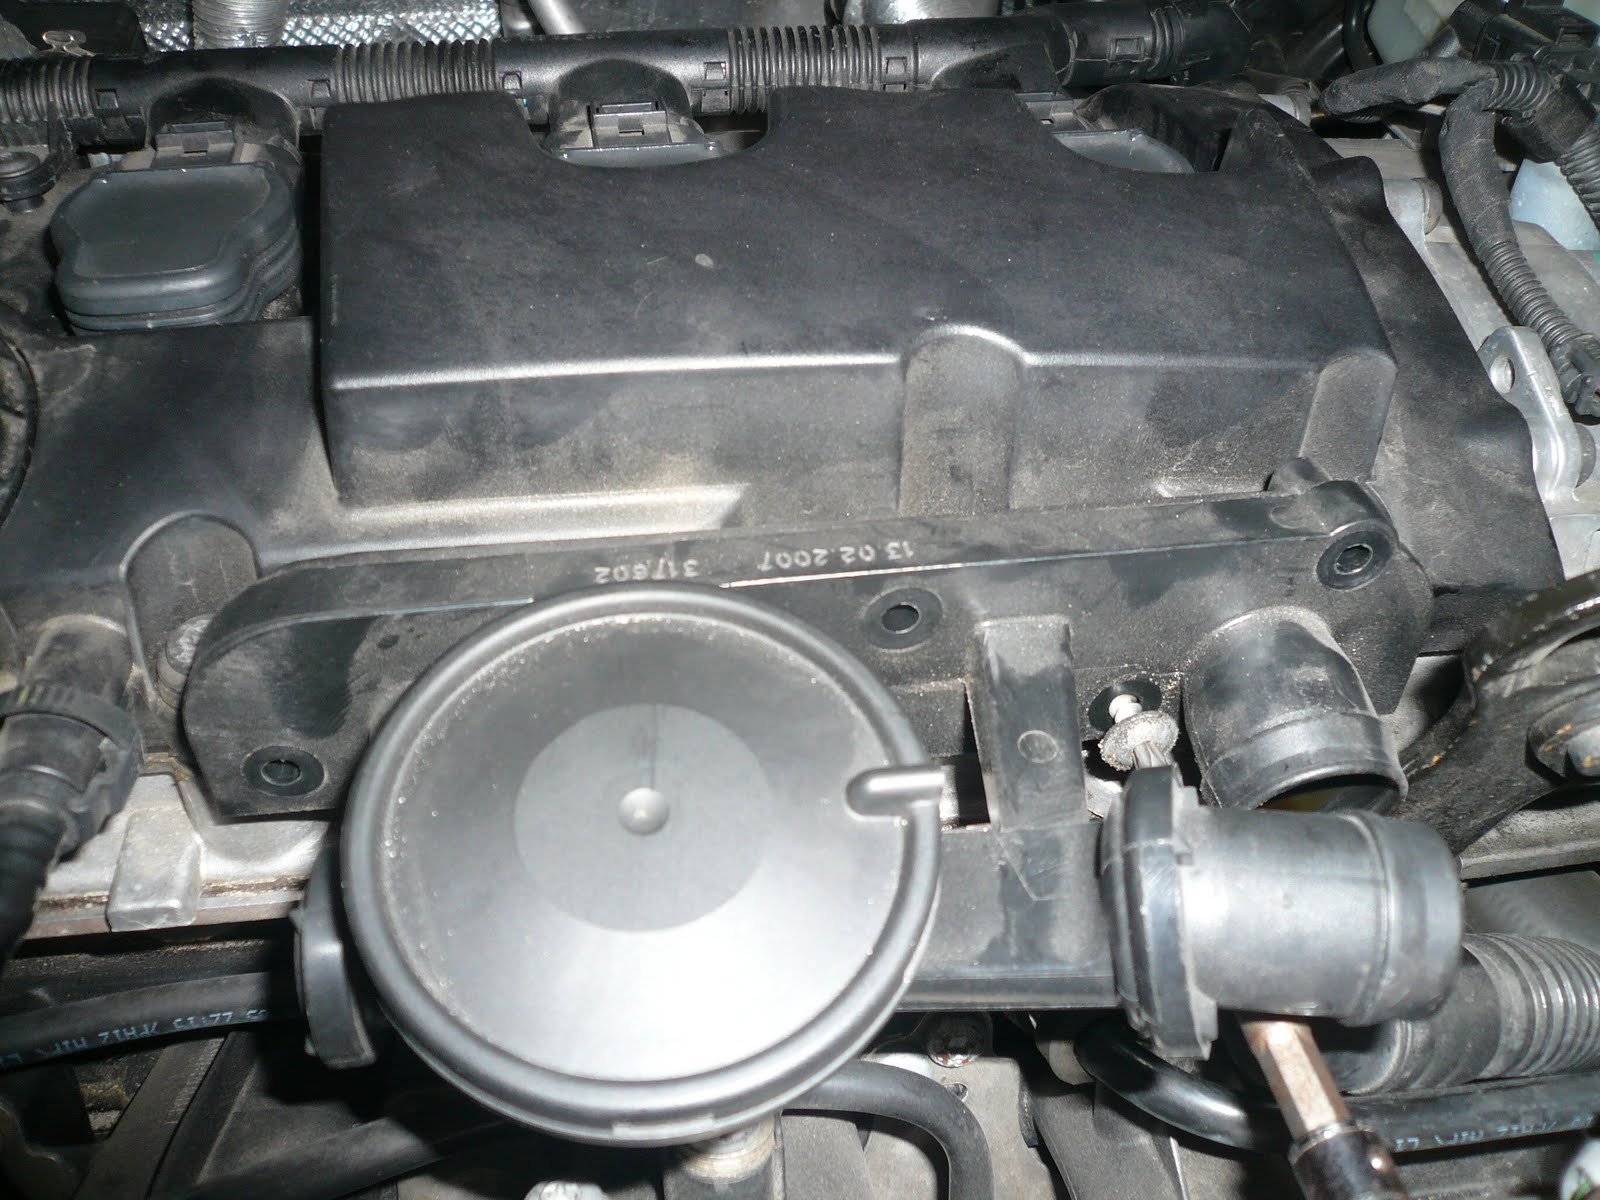 VW Passat Repair: How To Replace The PCV Crankcase Vent